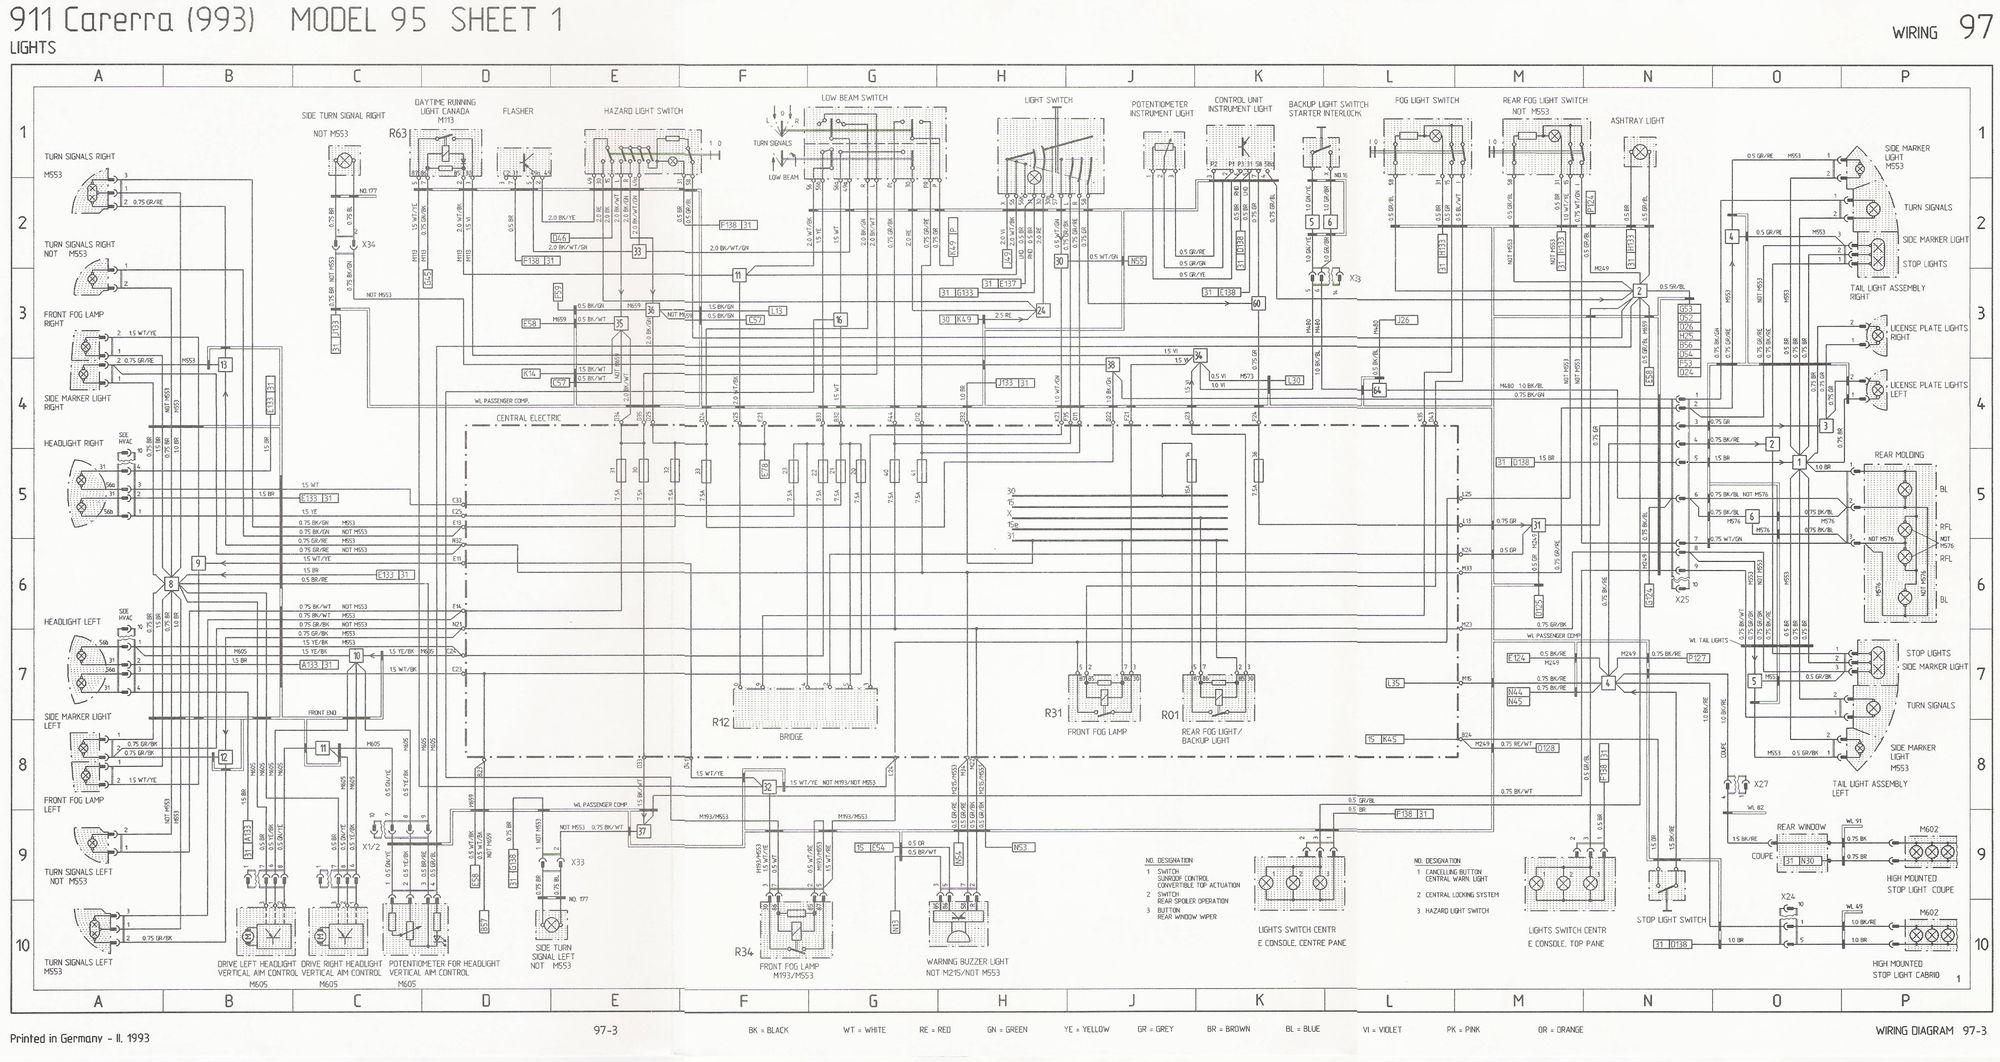 porsche 914 wiring diagram lighting circuit multiple lights uk 1974 engine harness